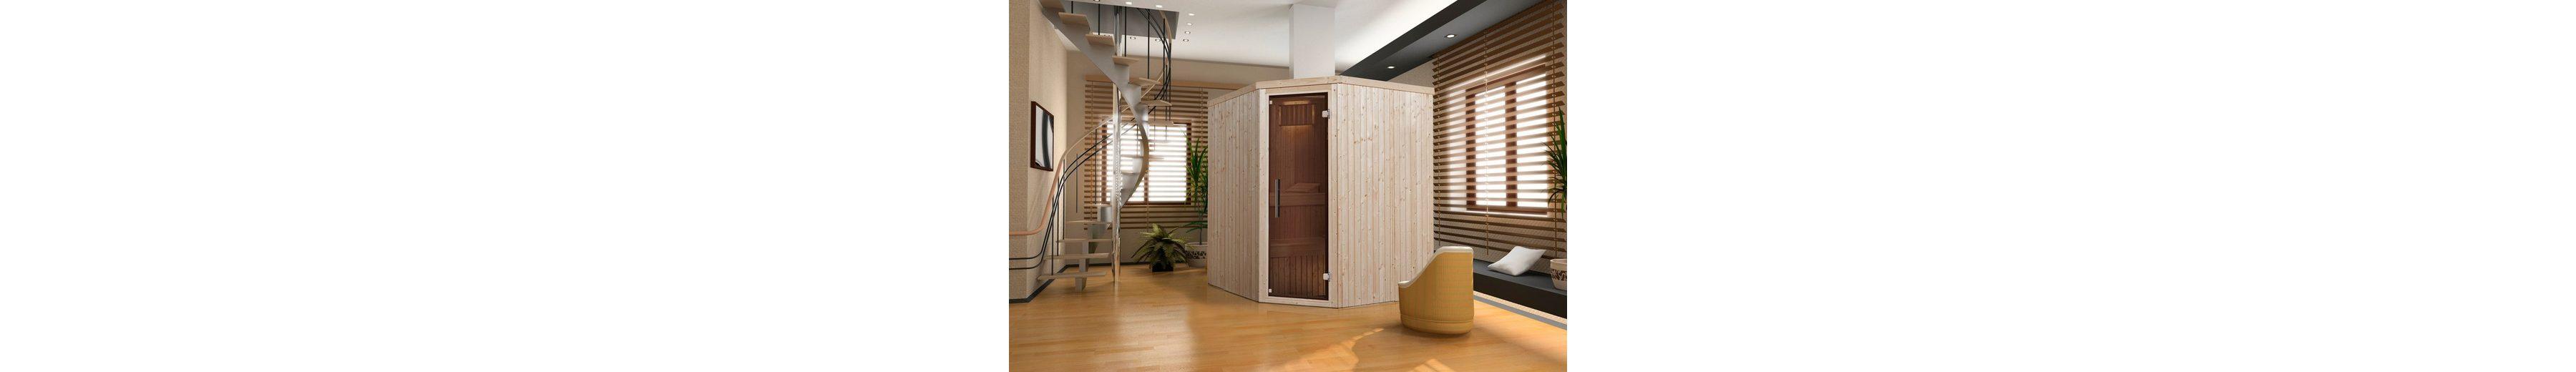 Sauna »Lyngdal 3 Trend Kompakt«, 192/175/199 cm, 68 mm, 8-KW-Ofen